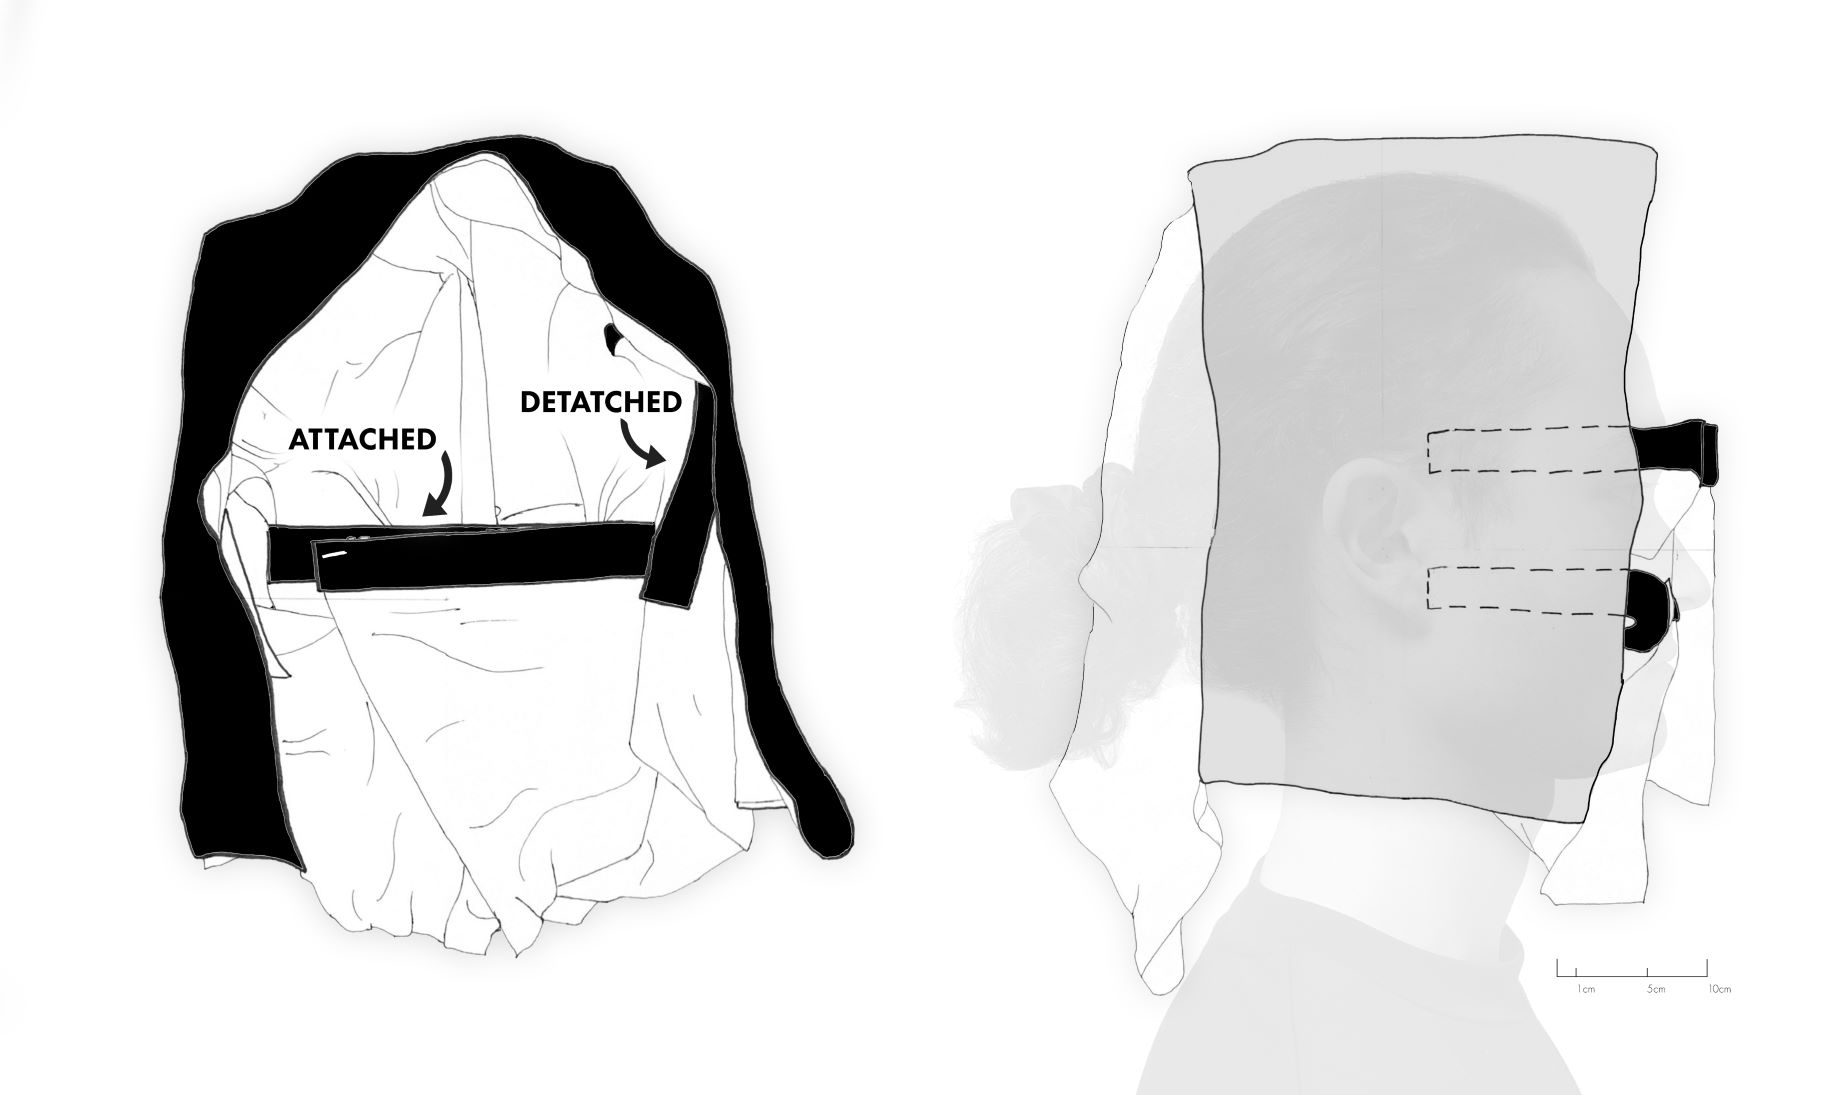 stone_stewart_diagram_web